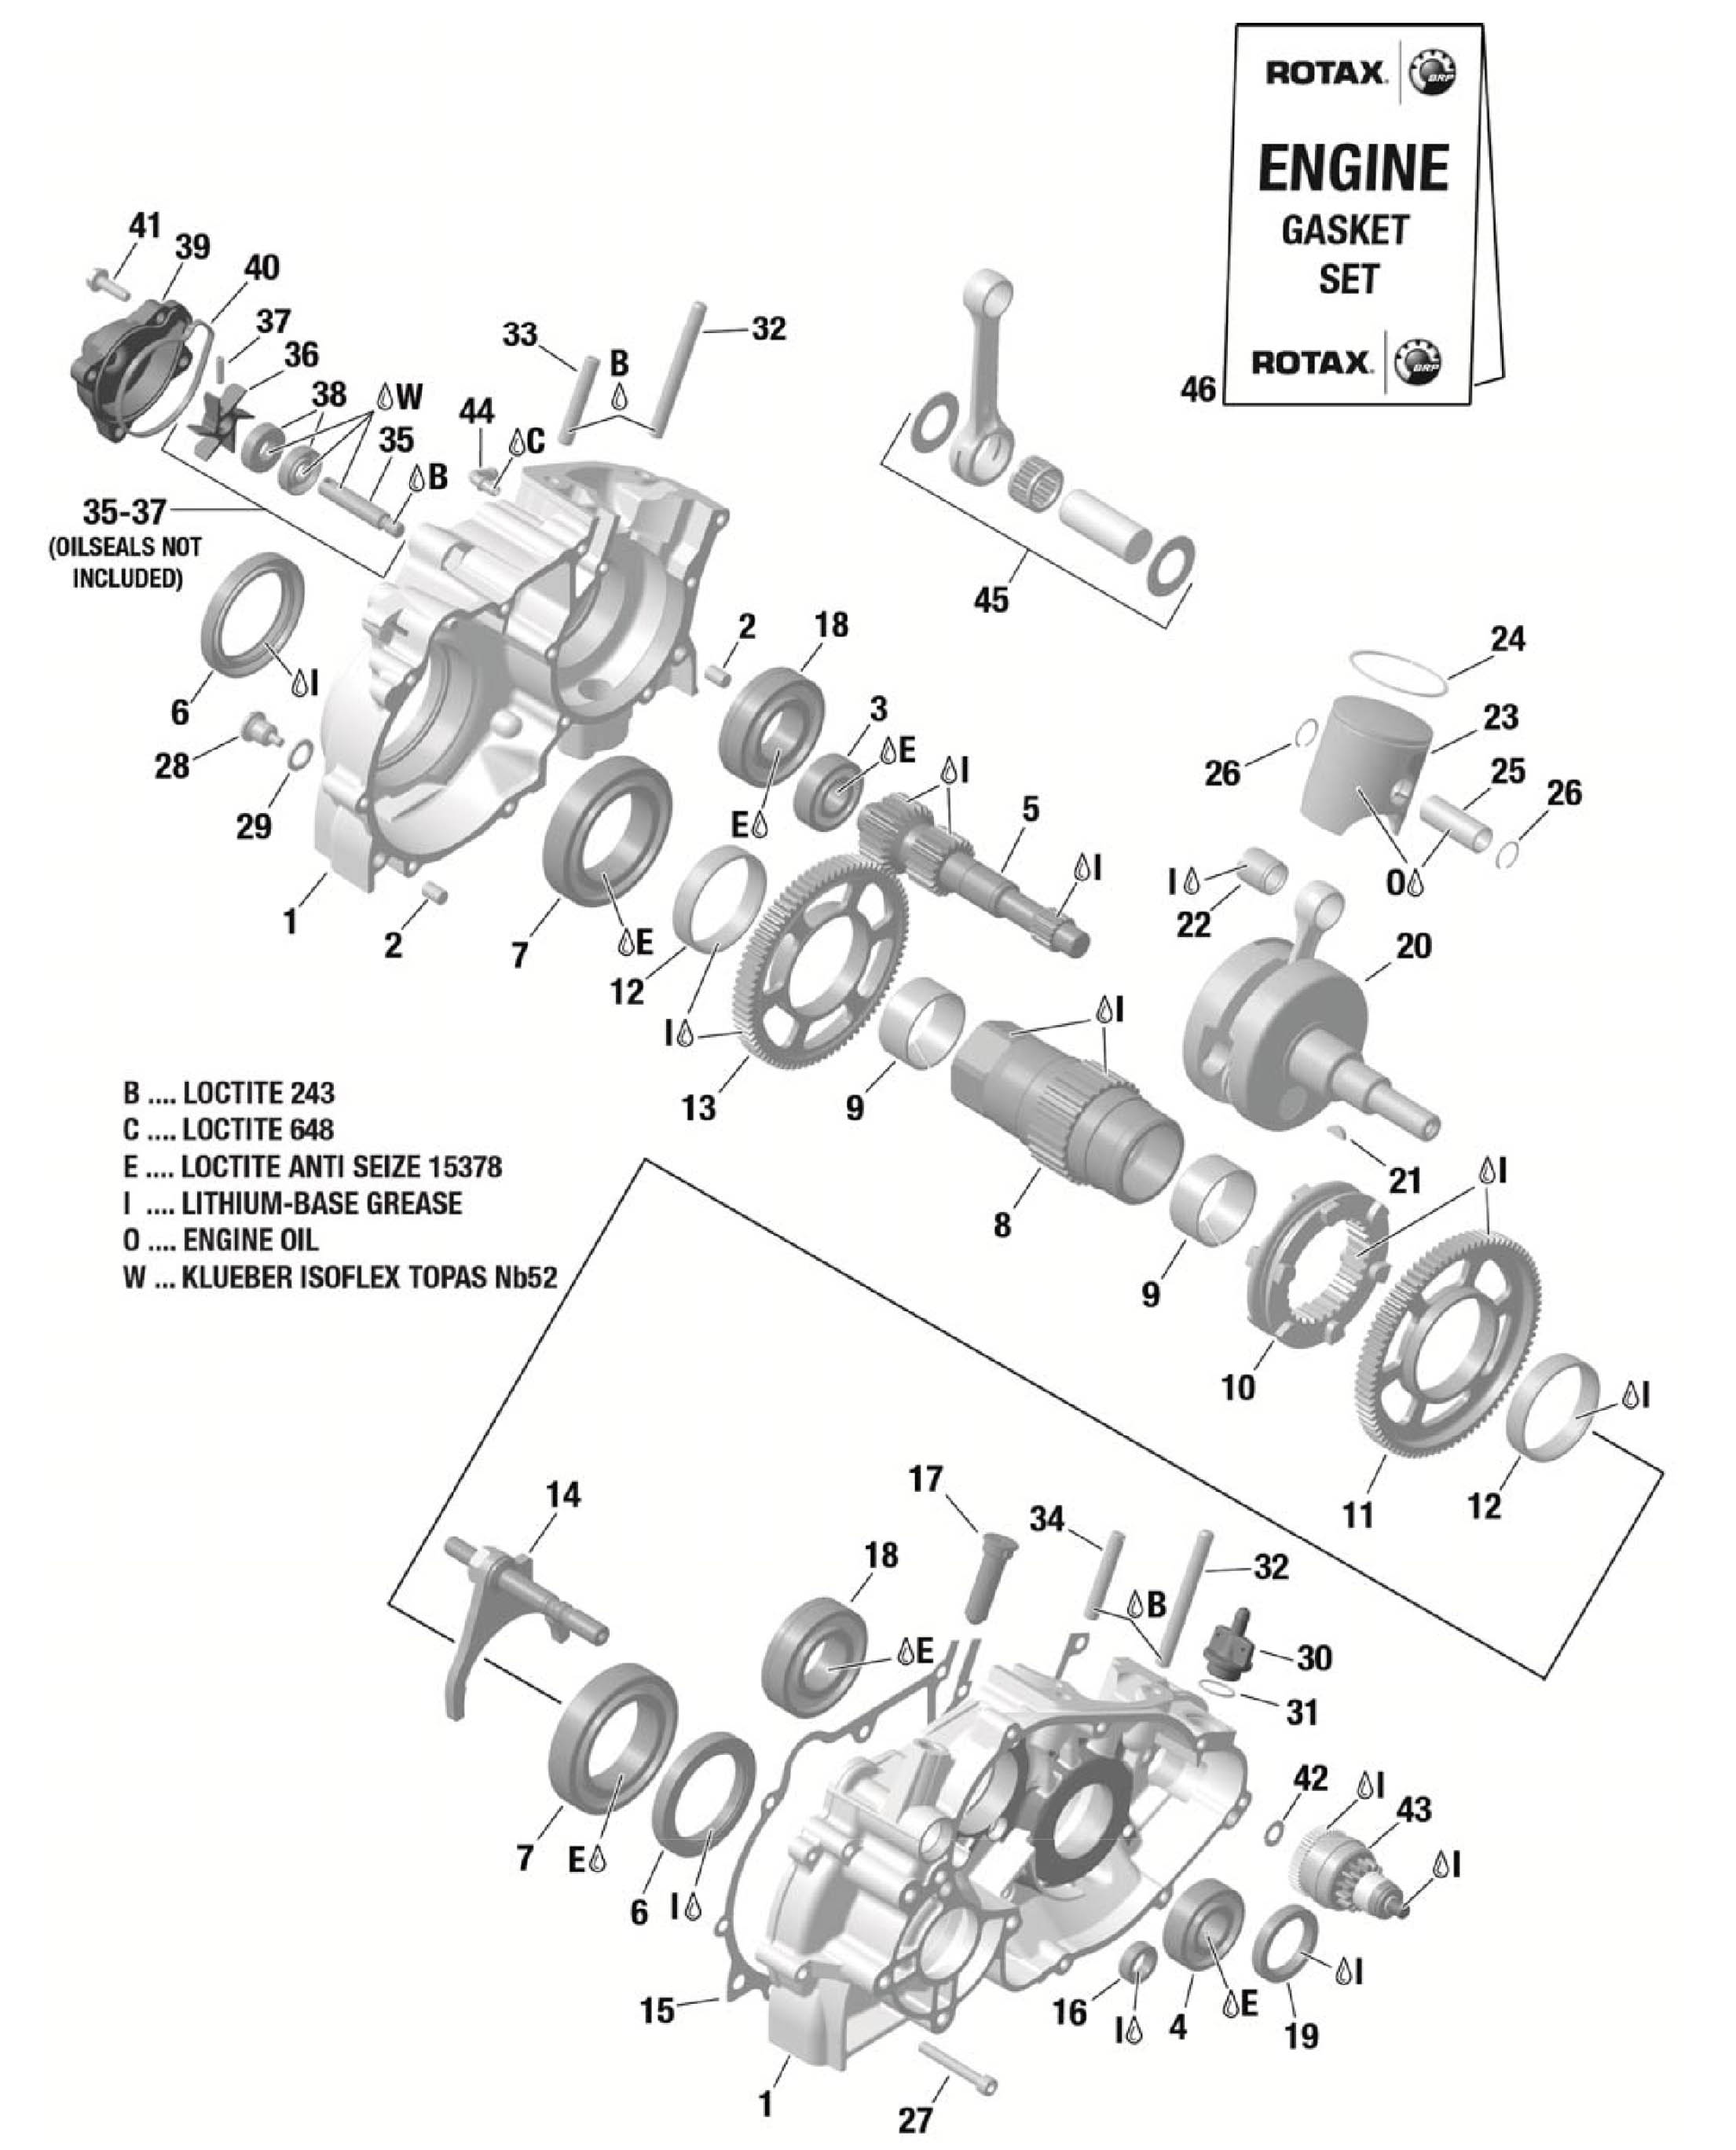 Crankcase Boutique Psl Karting